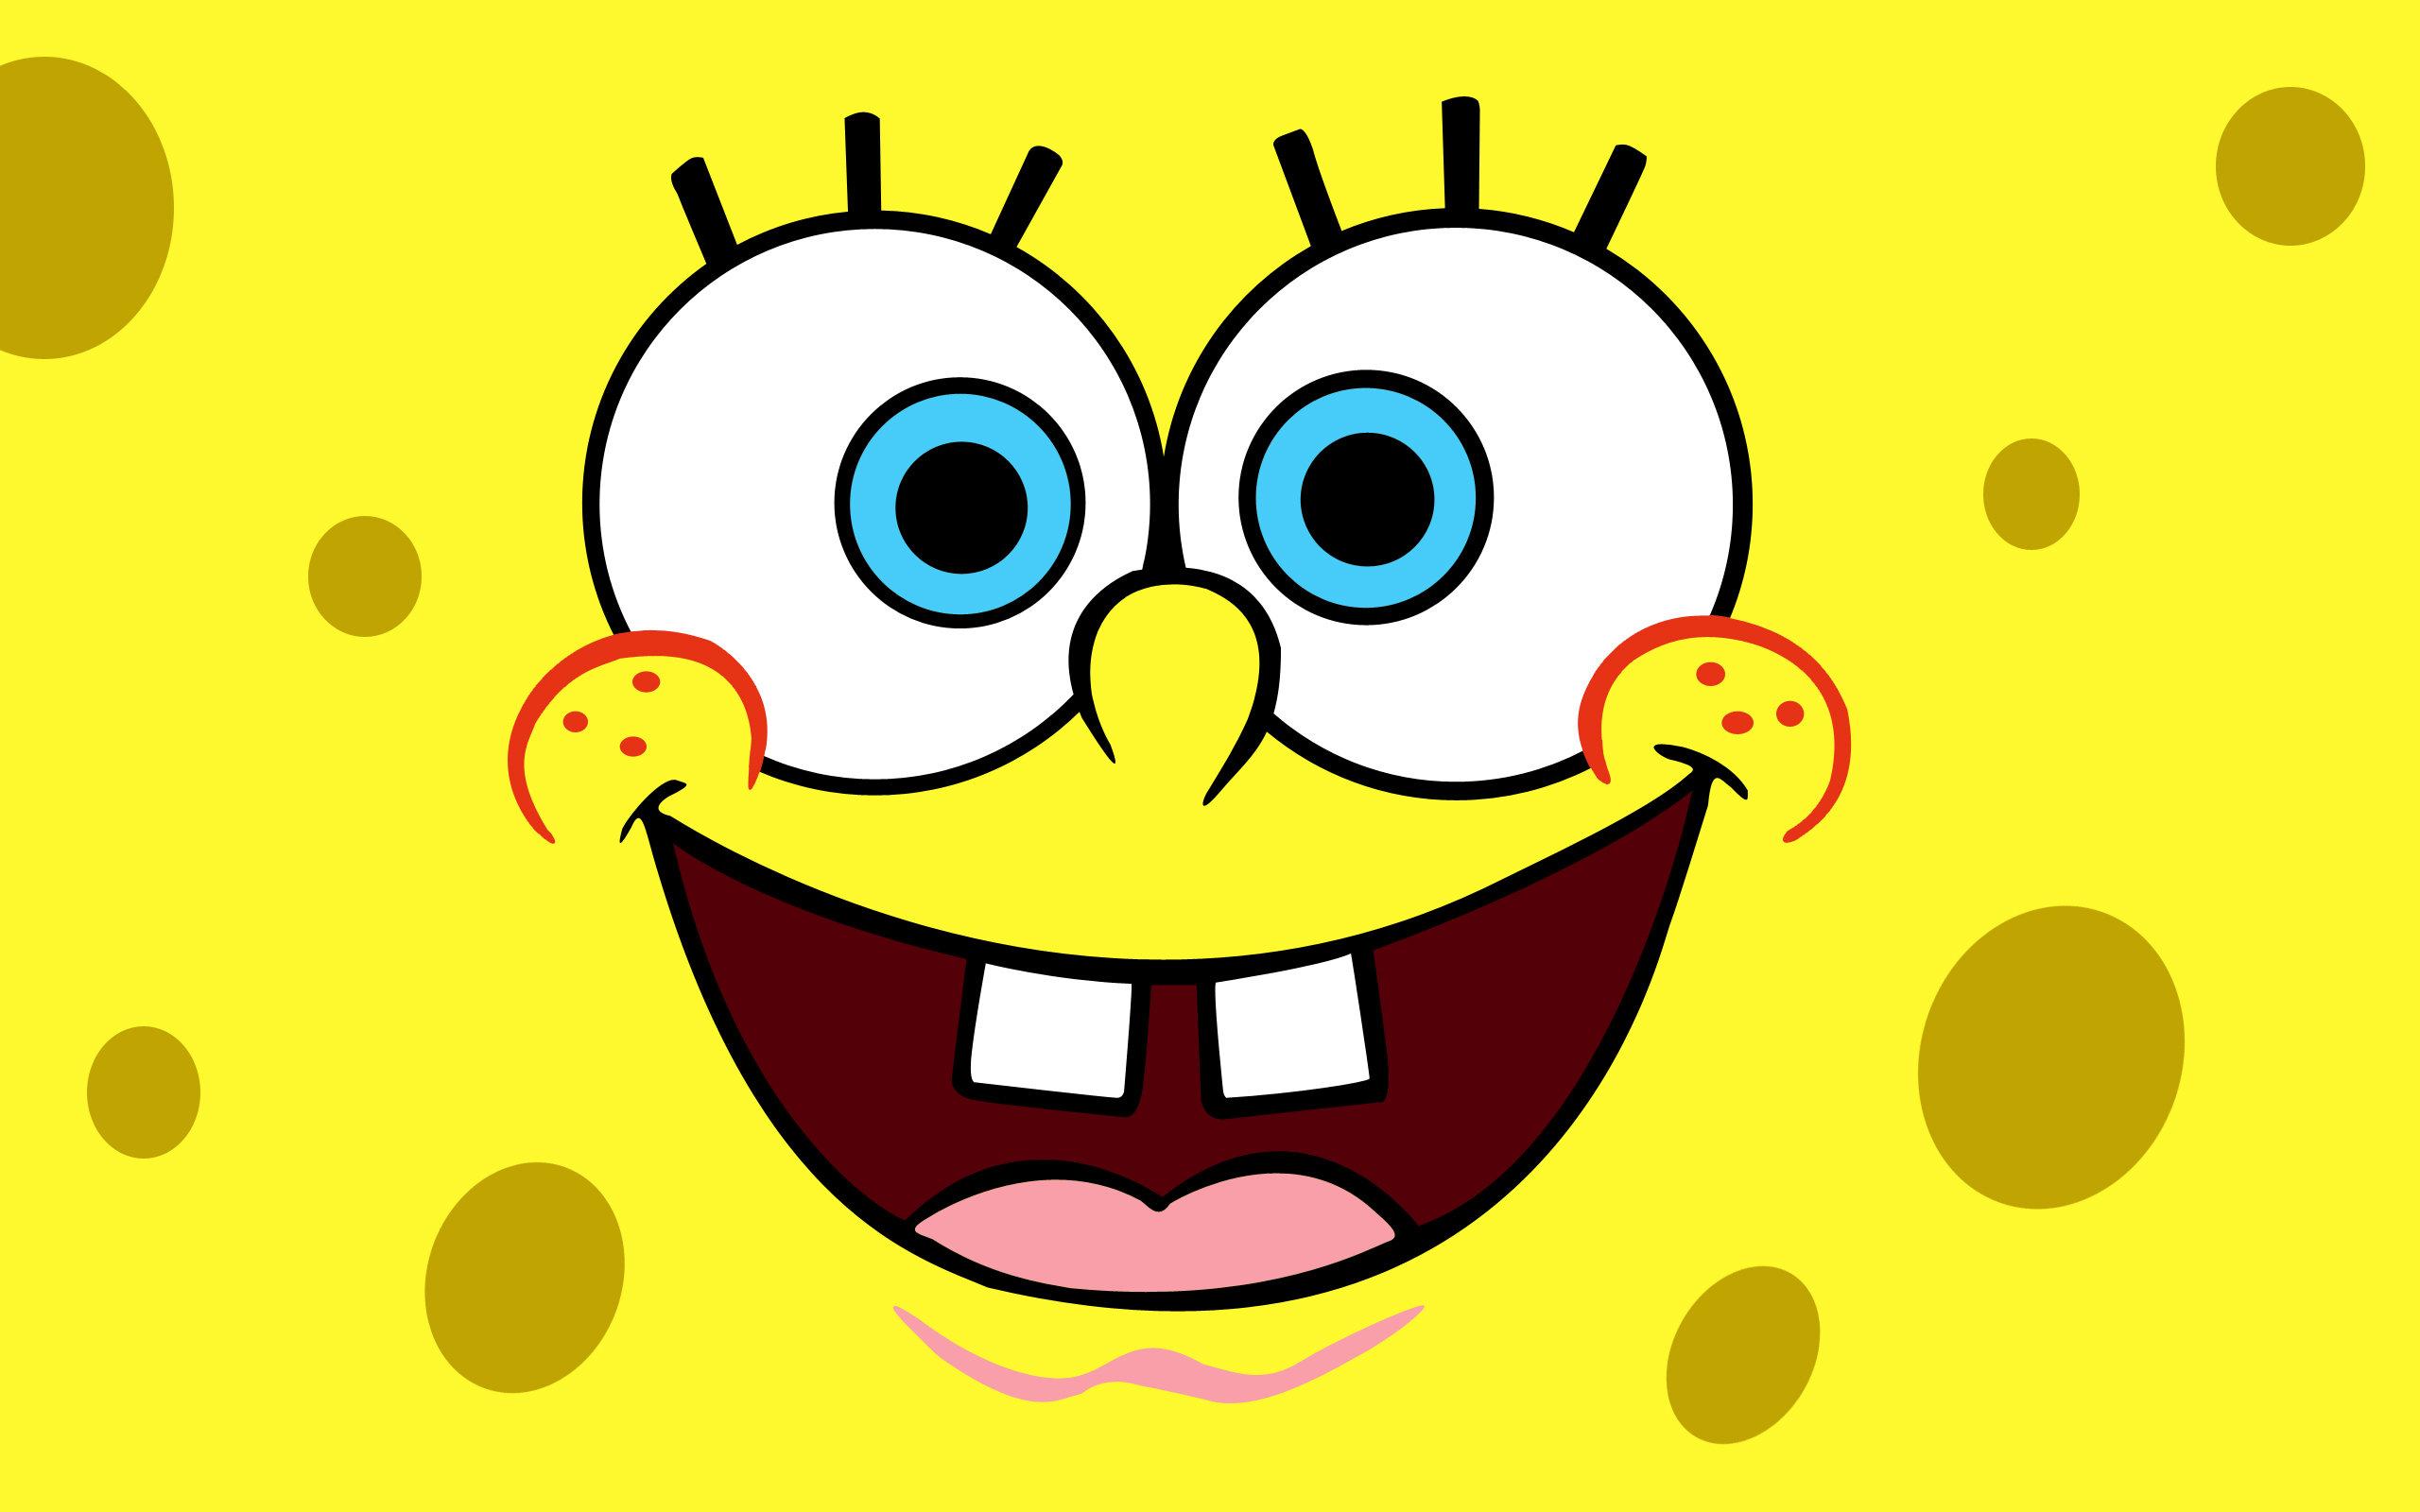 download hd 2560x1600 spongebob squarepants desktop wallpaper id